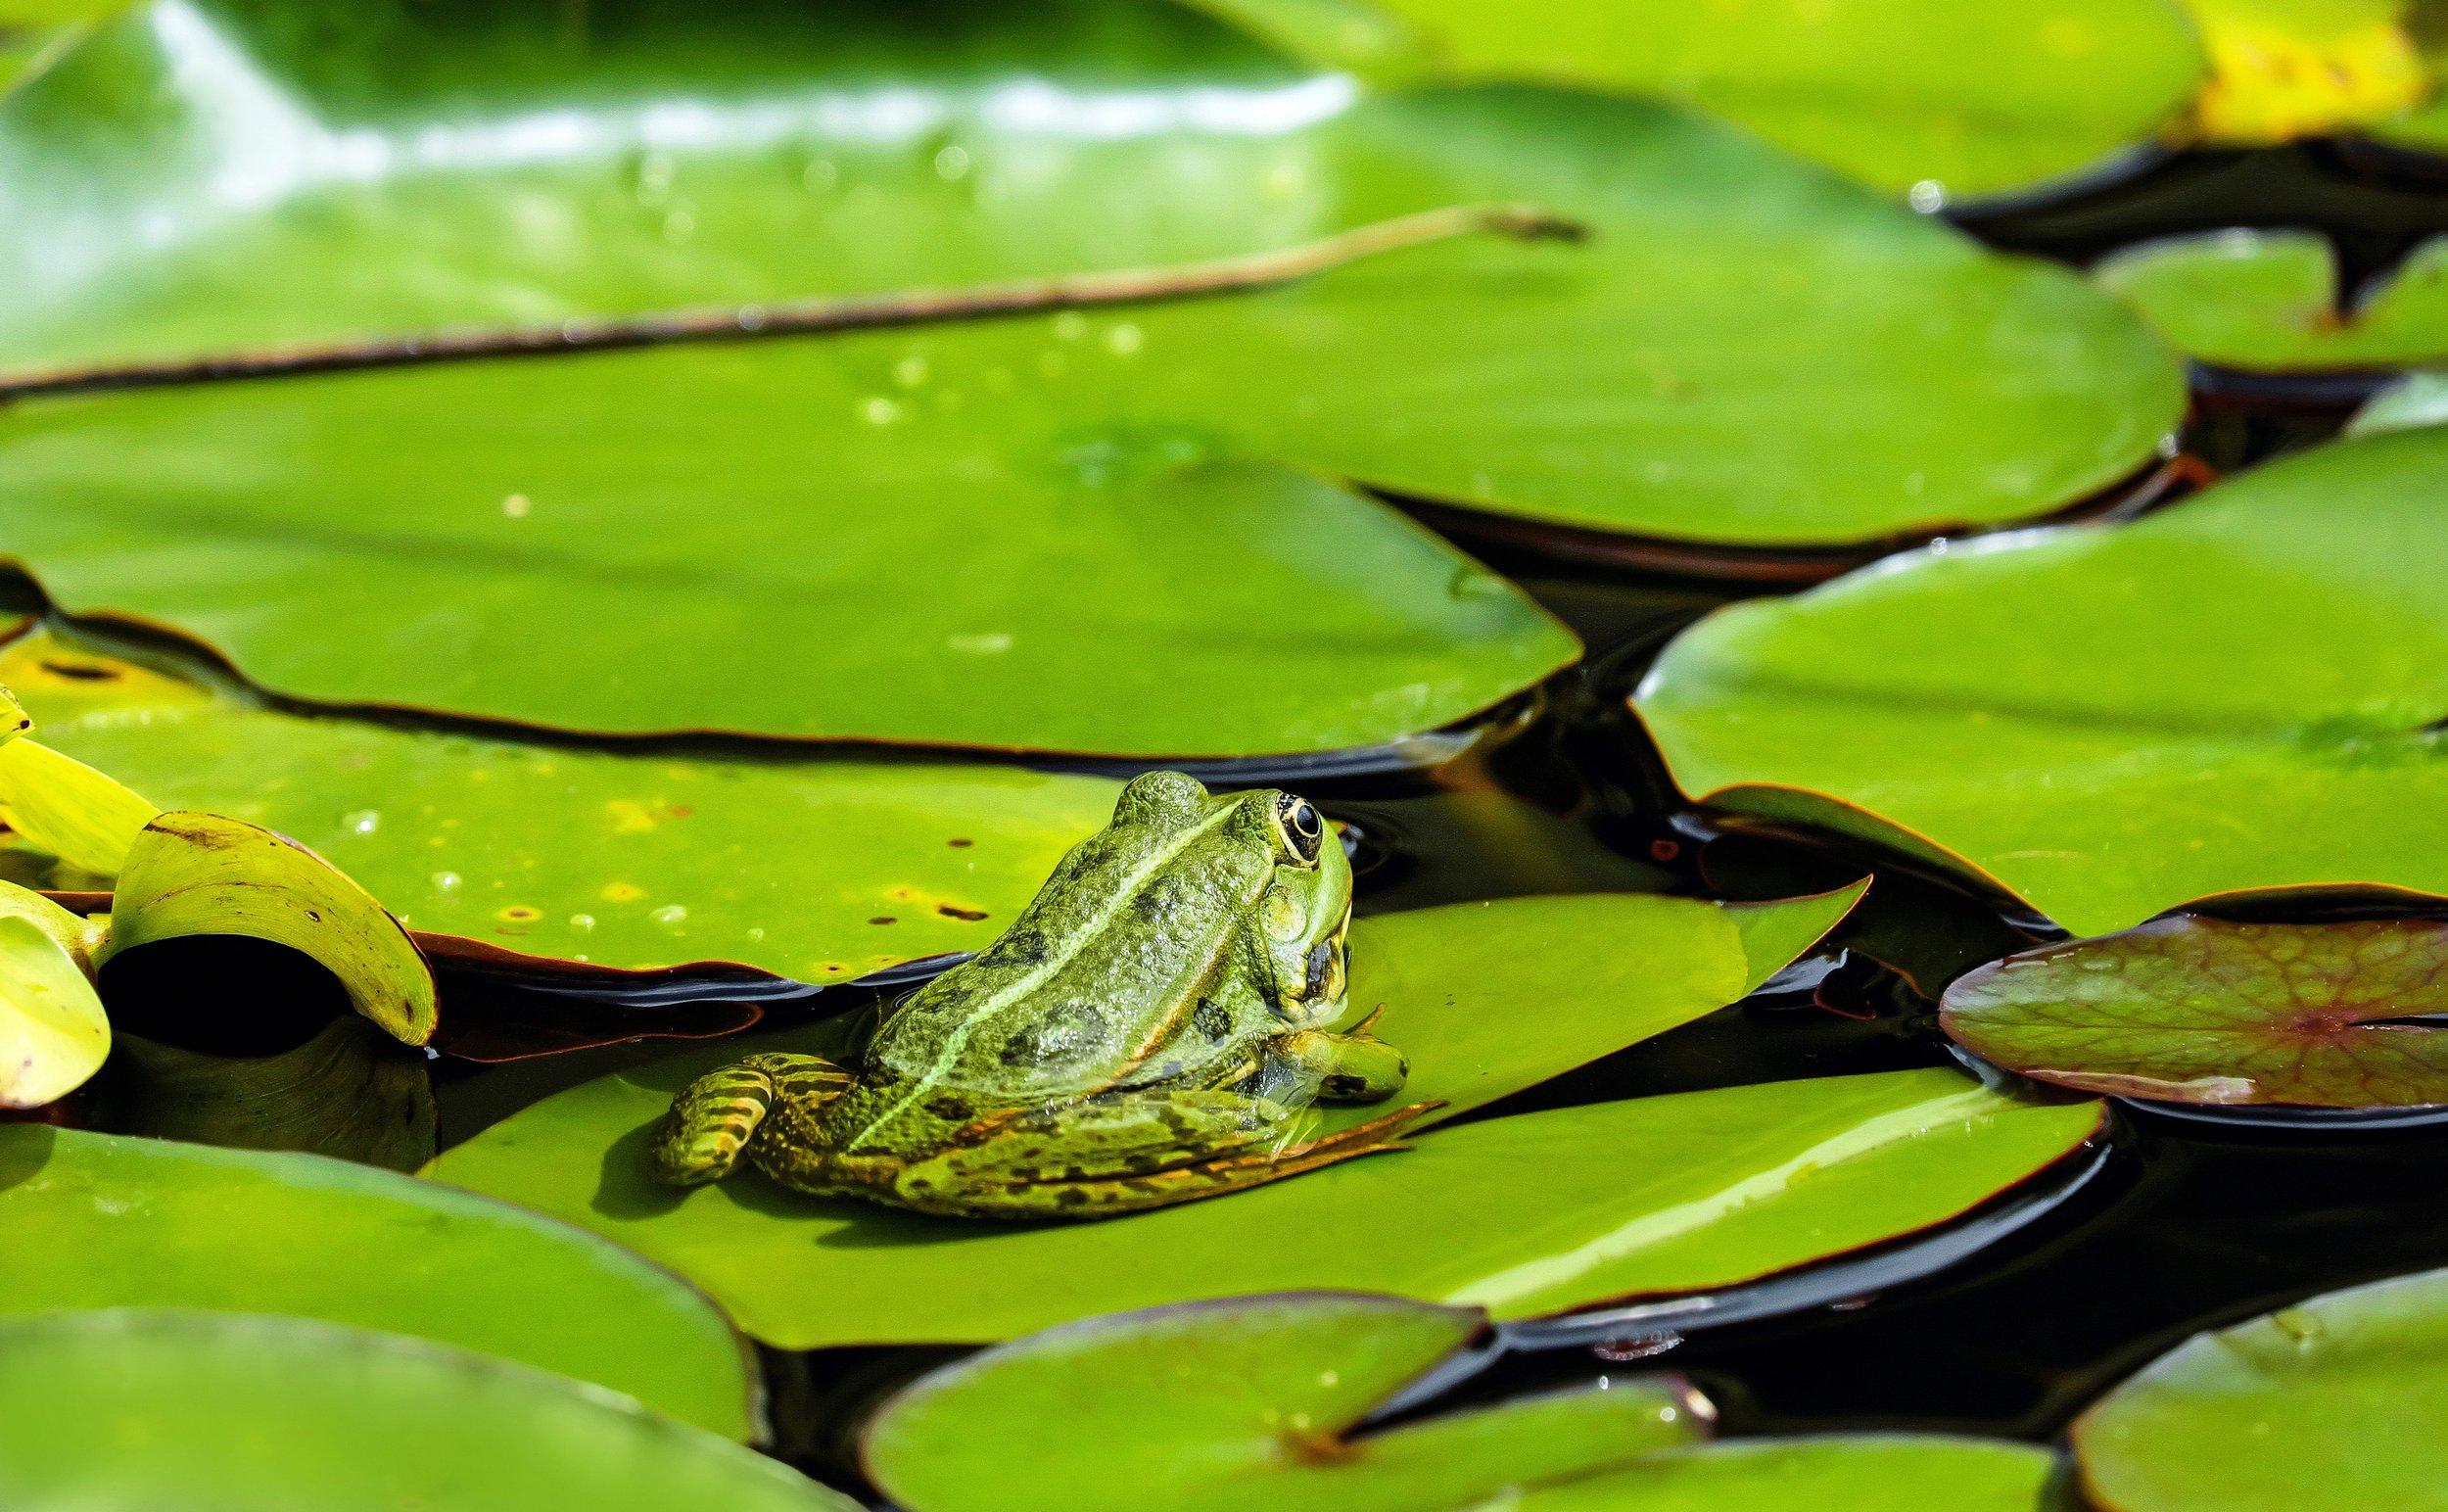 amphibian-animal-flora-122430.jpg